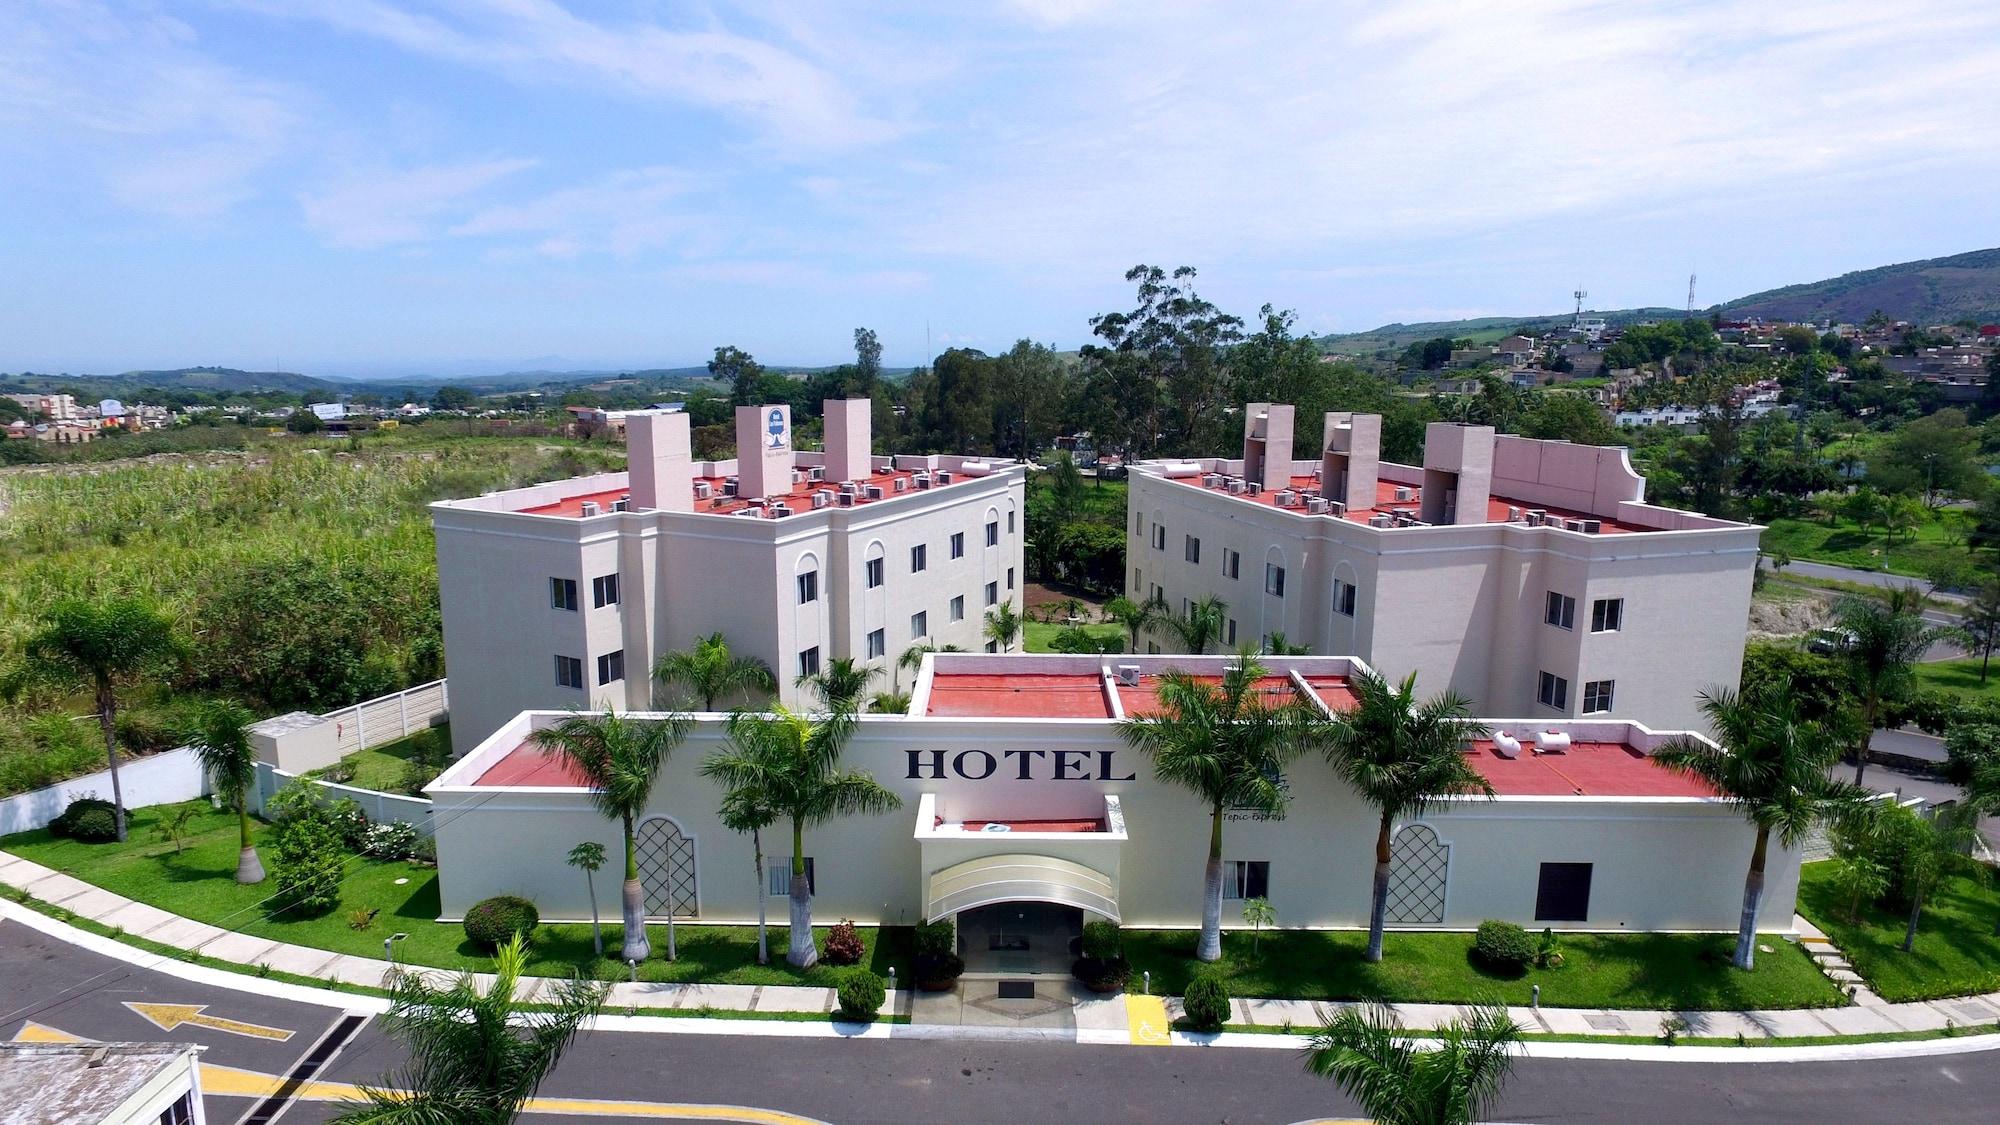 Hotel Las Palomas Tepic Express, Tepic